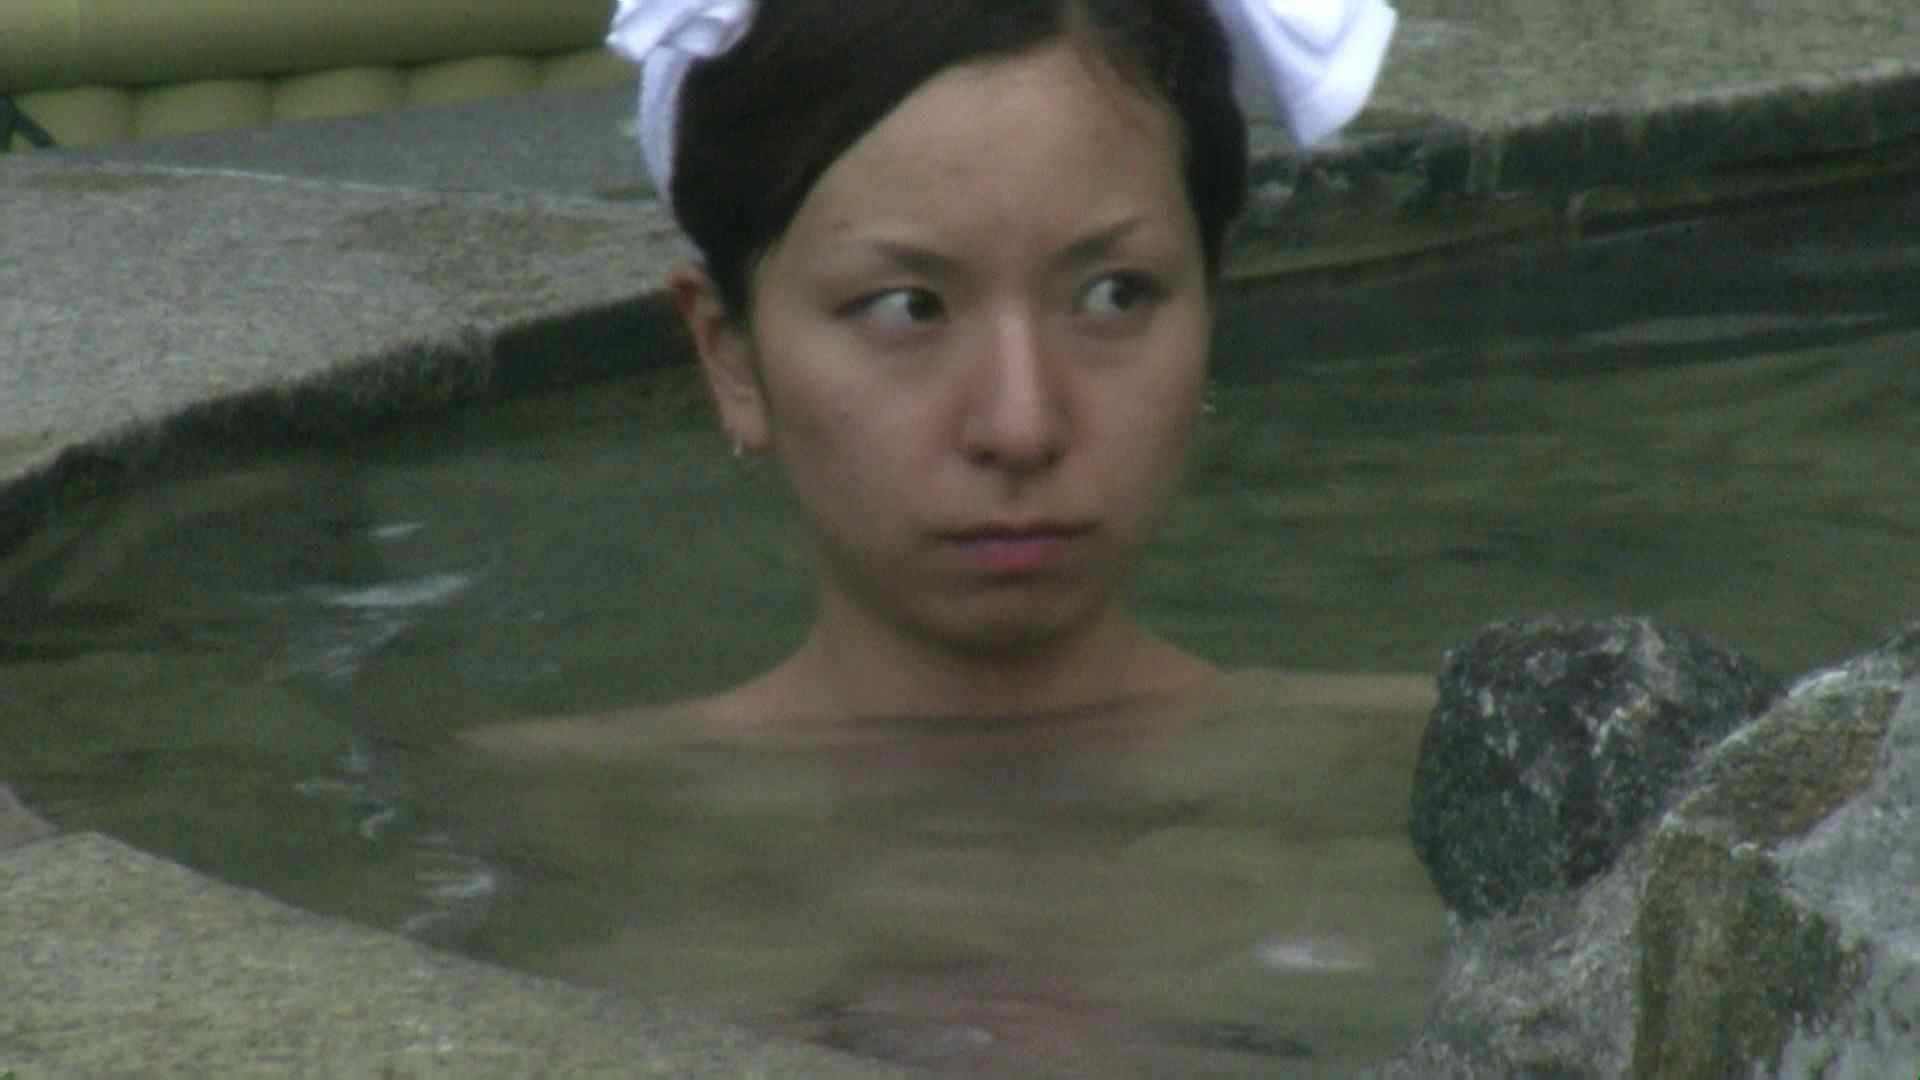 Aquaな露天風呂Vol.39【VIP】 綺麗なOLたち オマンコ動画キャプチャ 111枚 53